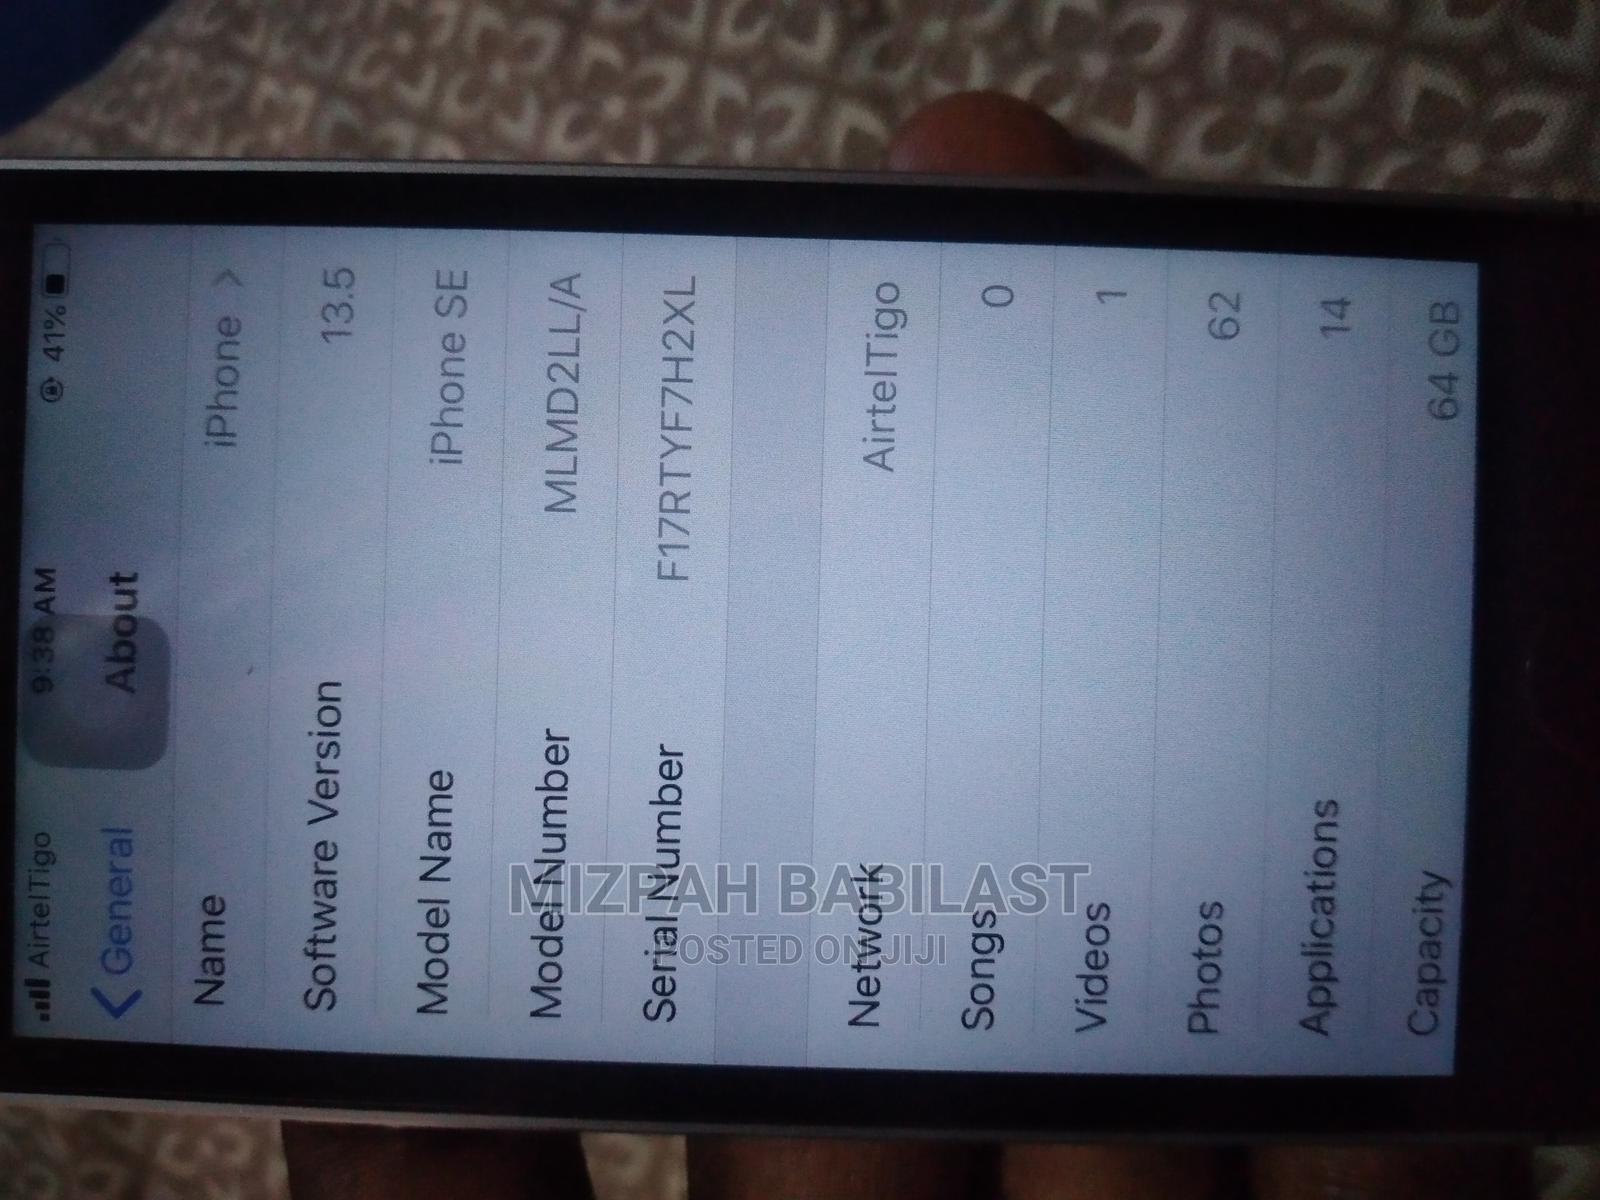 Apple iPhone SE 64 GB Black | Mobile Phones for sale in Sekyere South, Ashanti, Ghana